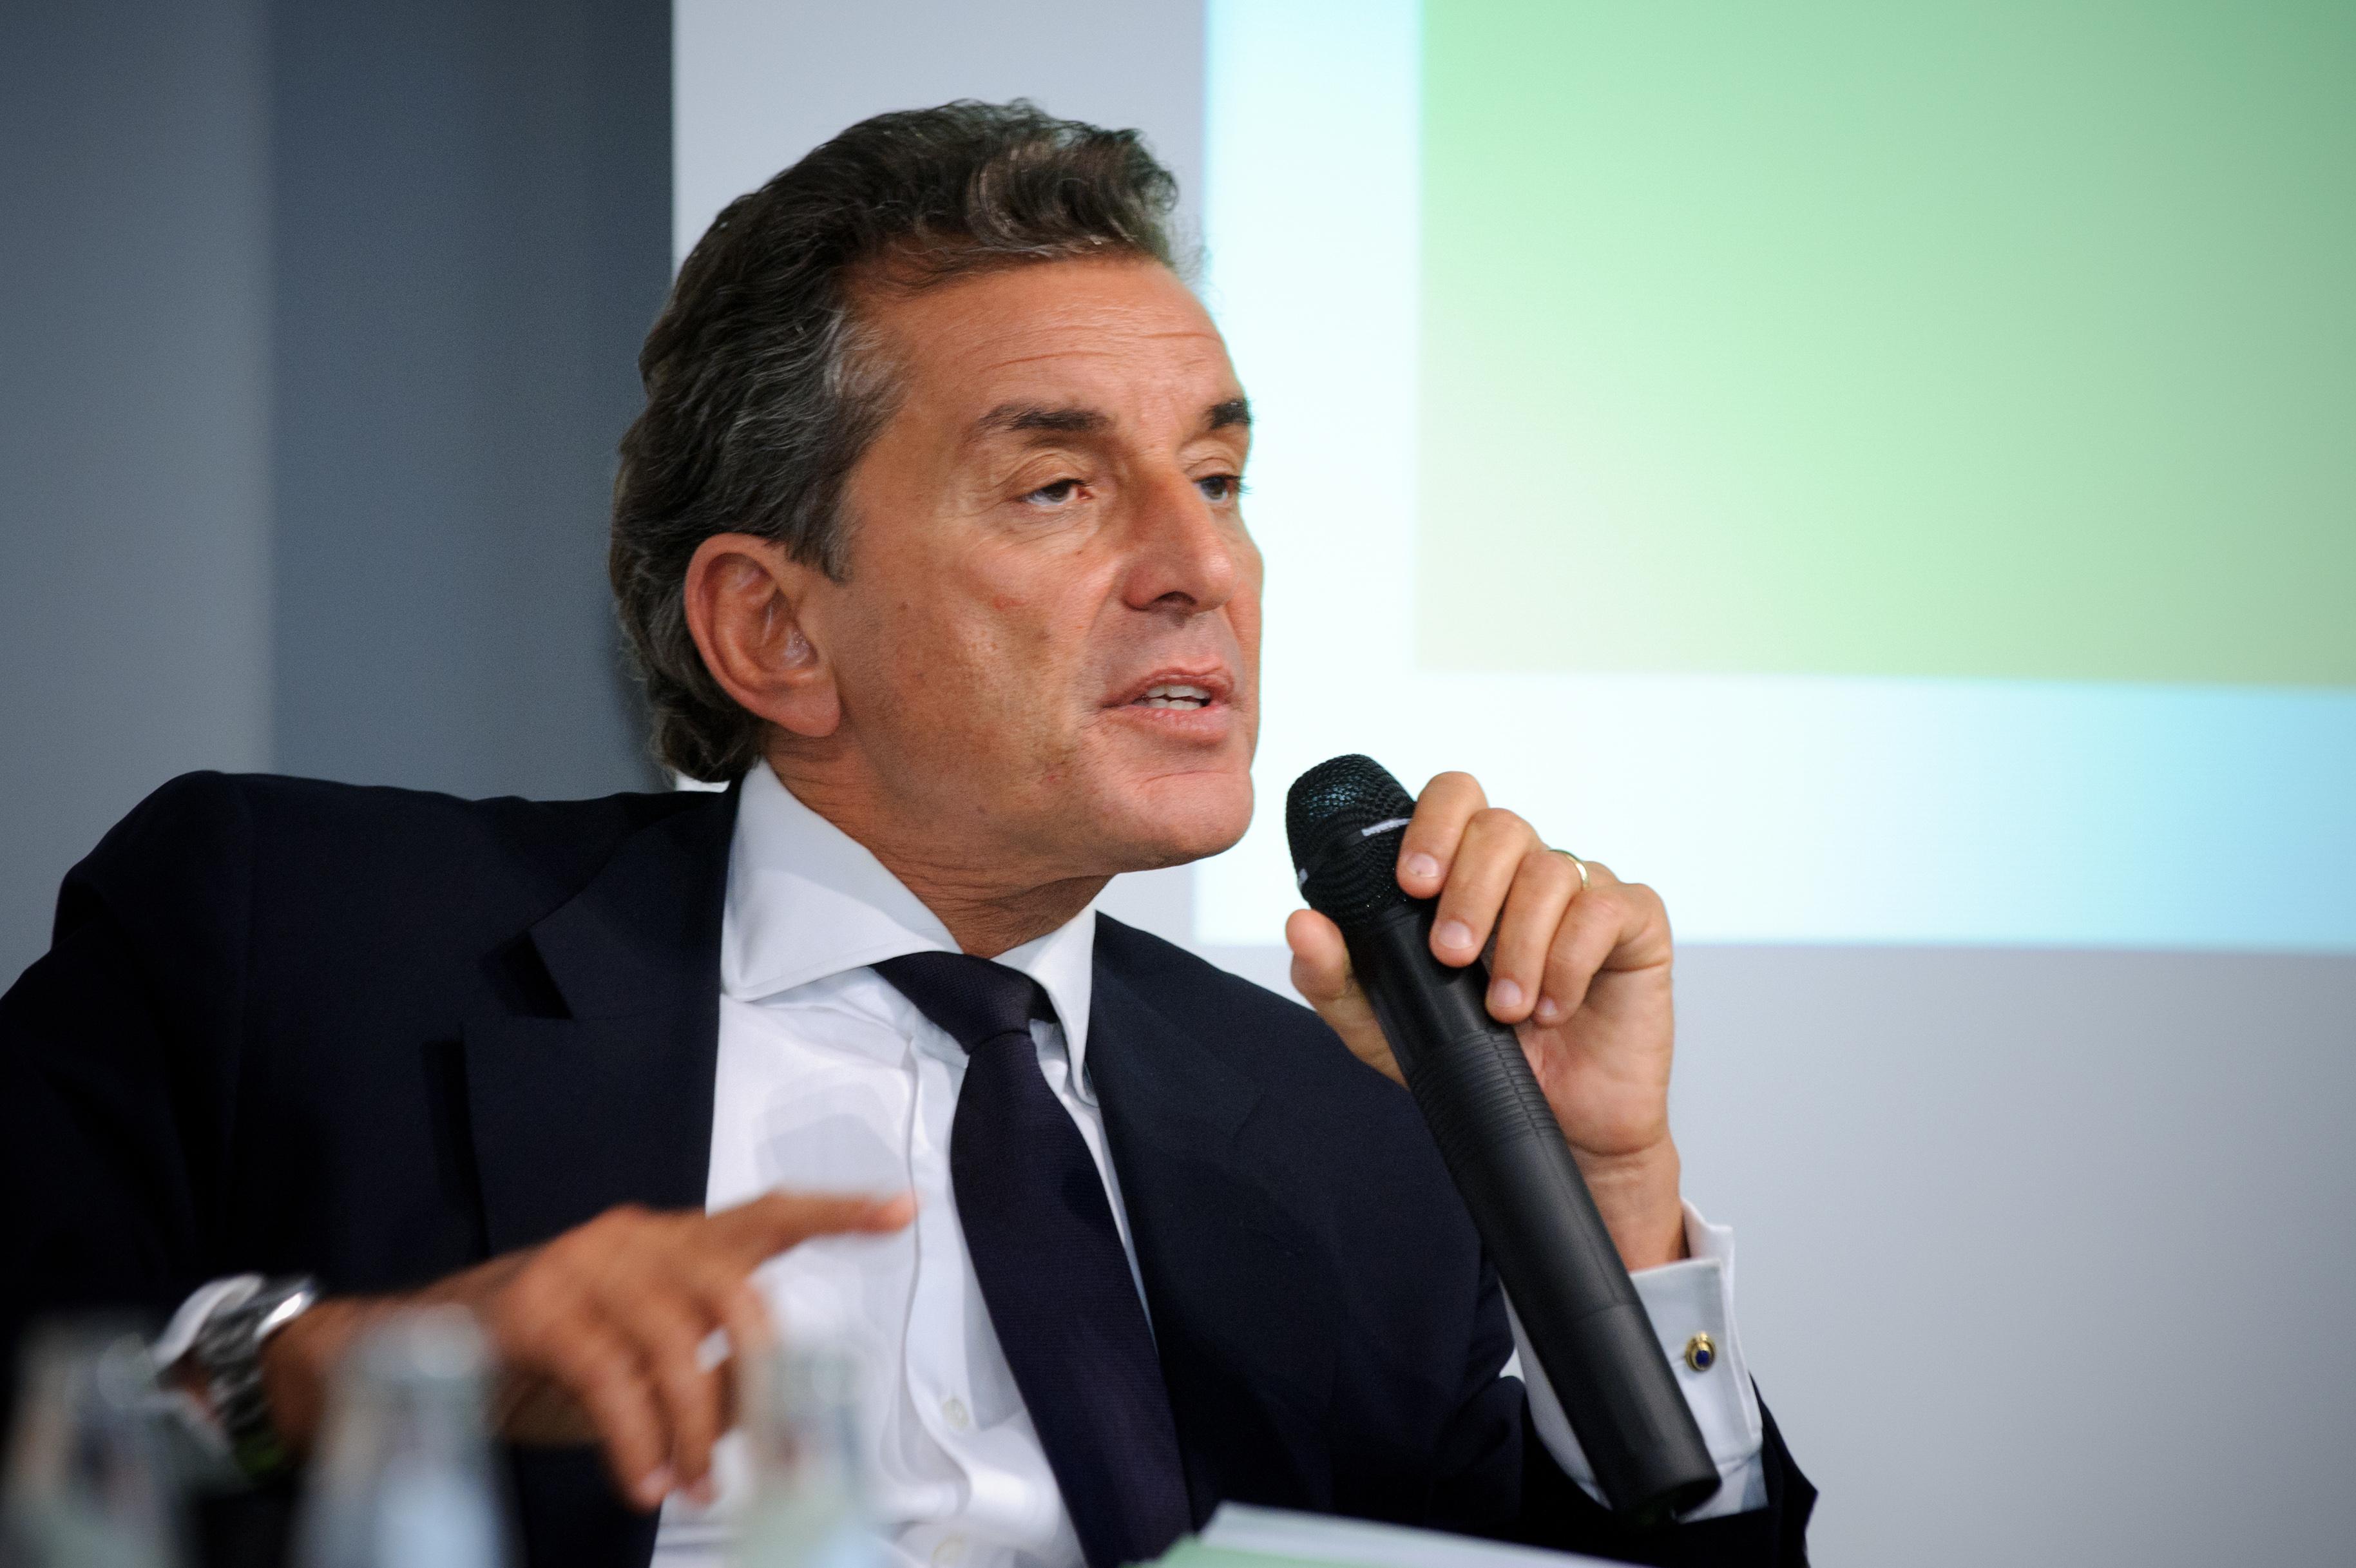 Dr. Michel Friedman (Rechtsanwalt u. Journalist, Frankfurt a.M.). Bild: flickr.com, Heinrich-Böll-Stiftung (https://flic.kr/p/aBwLqo)  CC BY-SA 2.0 (https://creativecommons.org/licenses/by-sa/2.0/)